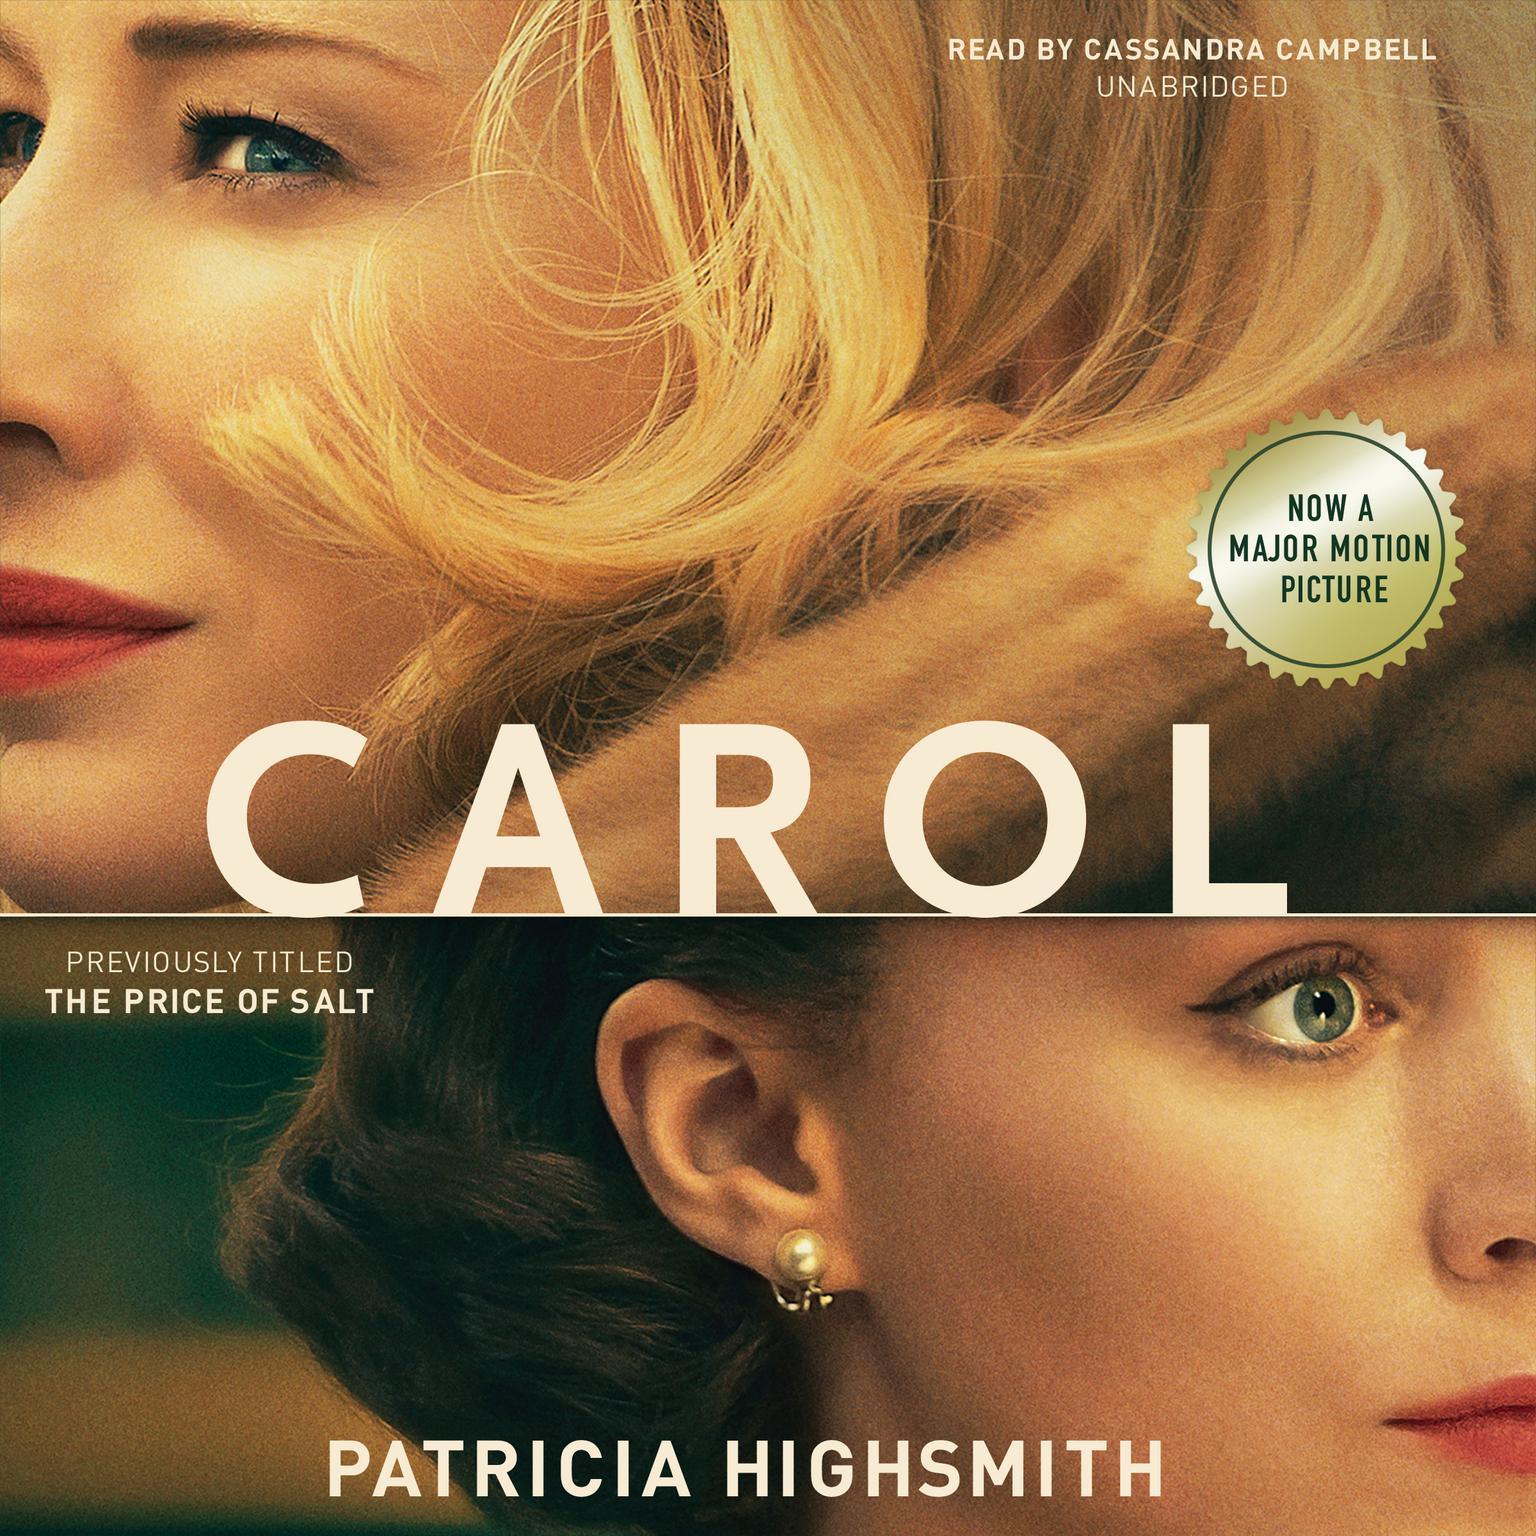 Carol: The Price of Salt Audiobook, by Patricia Highsmith